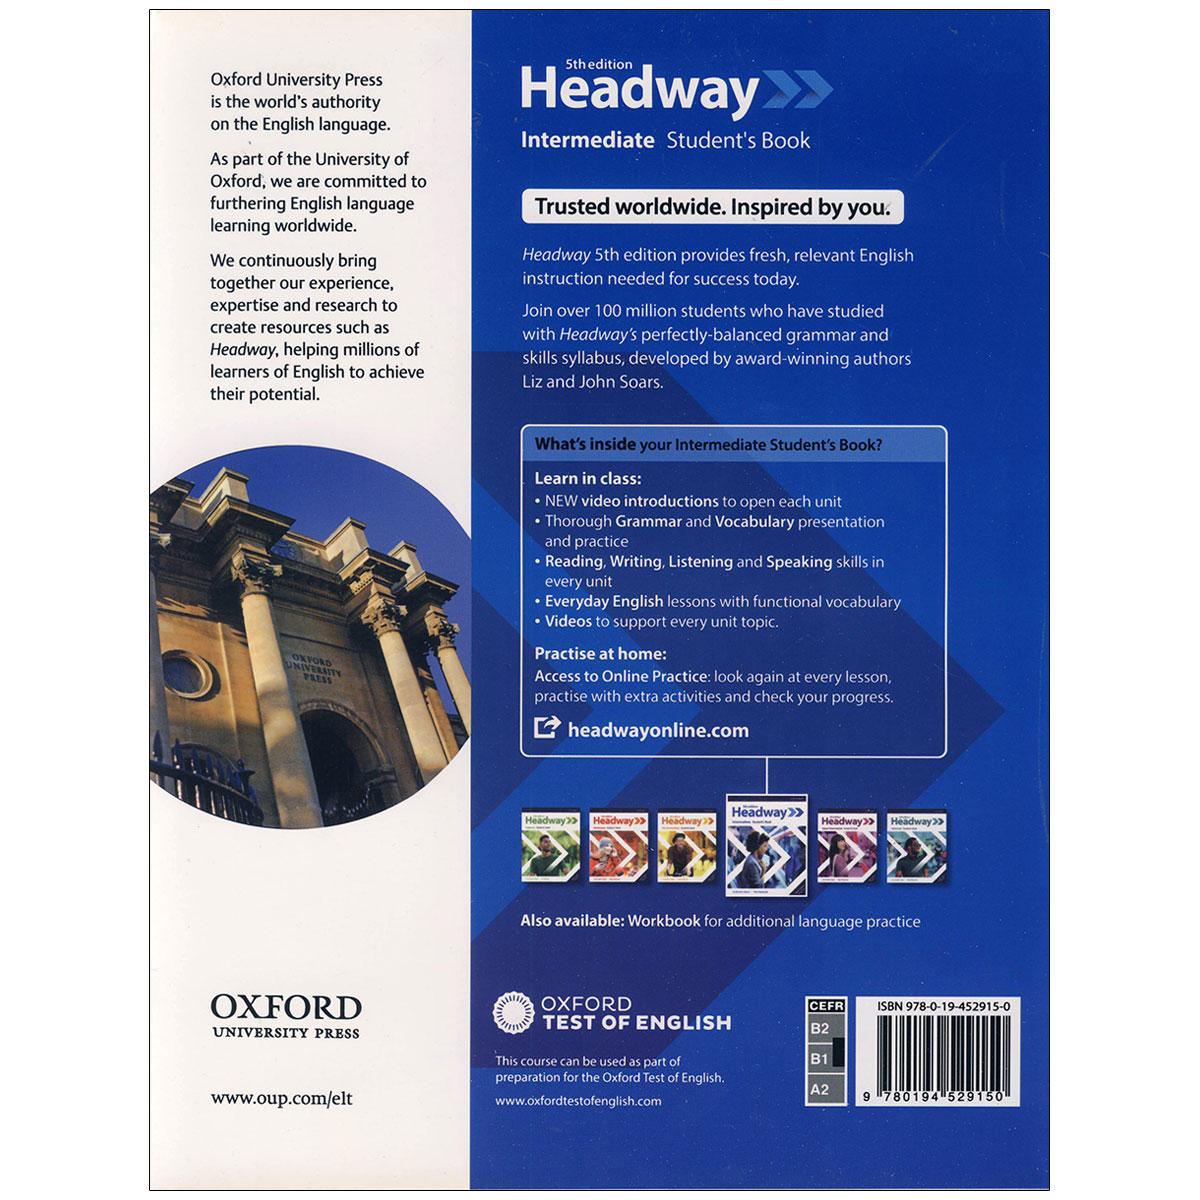 کتاب  headway intermediate 5th edition اثر john and liz soars and Paul Hancock انتشارات آکسفورد thumb 2 1